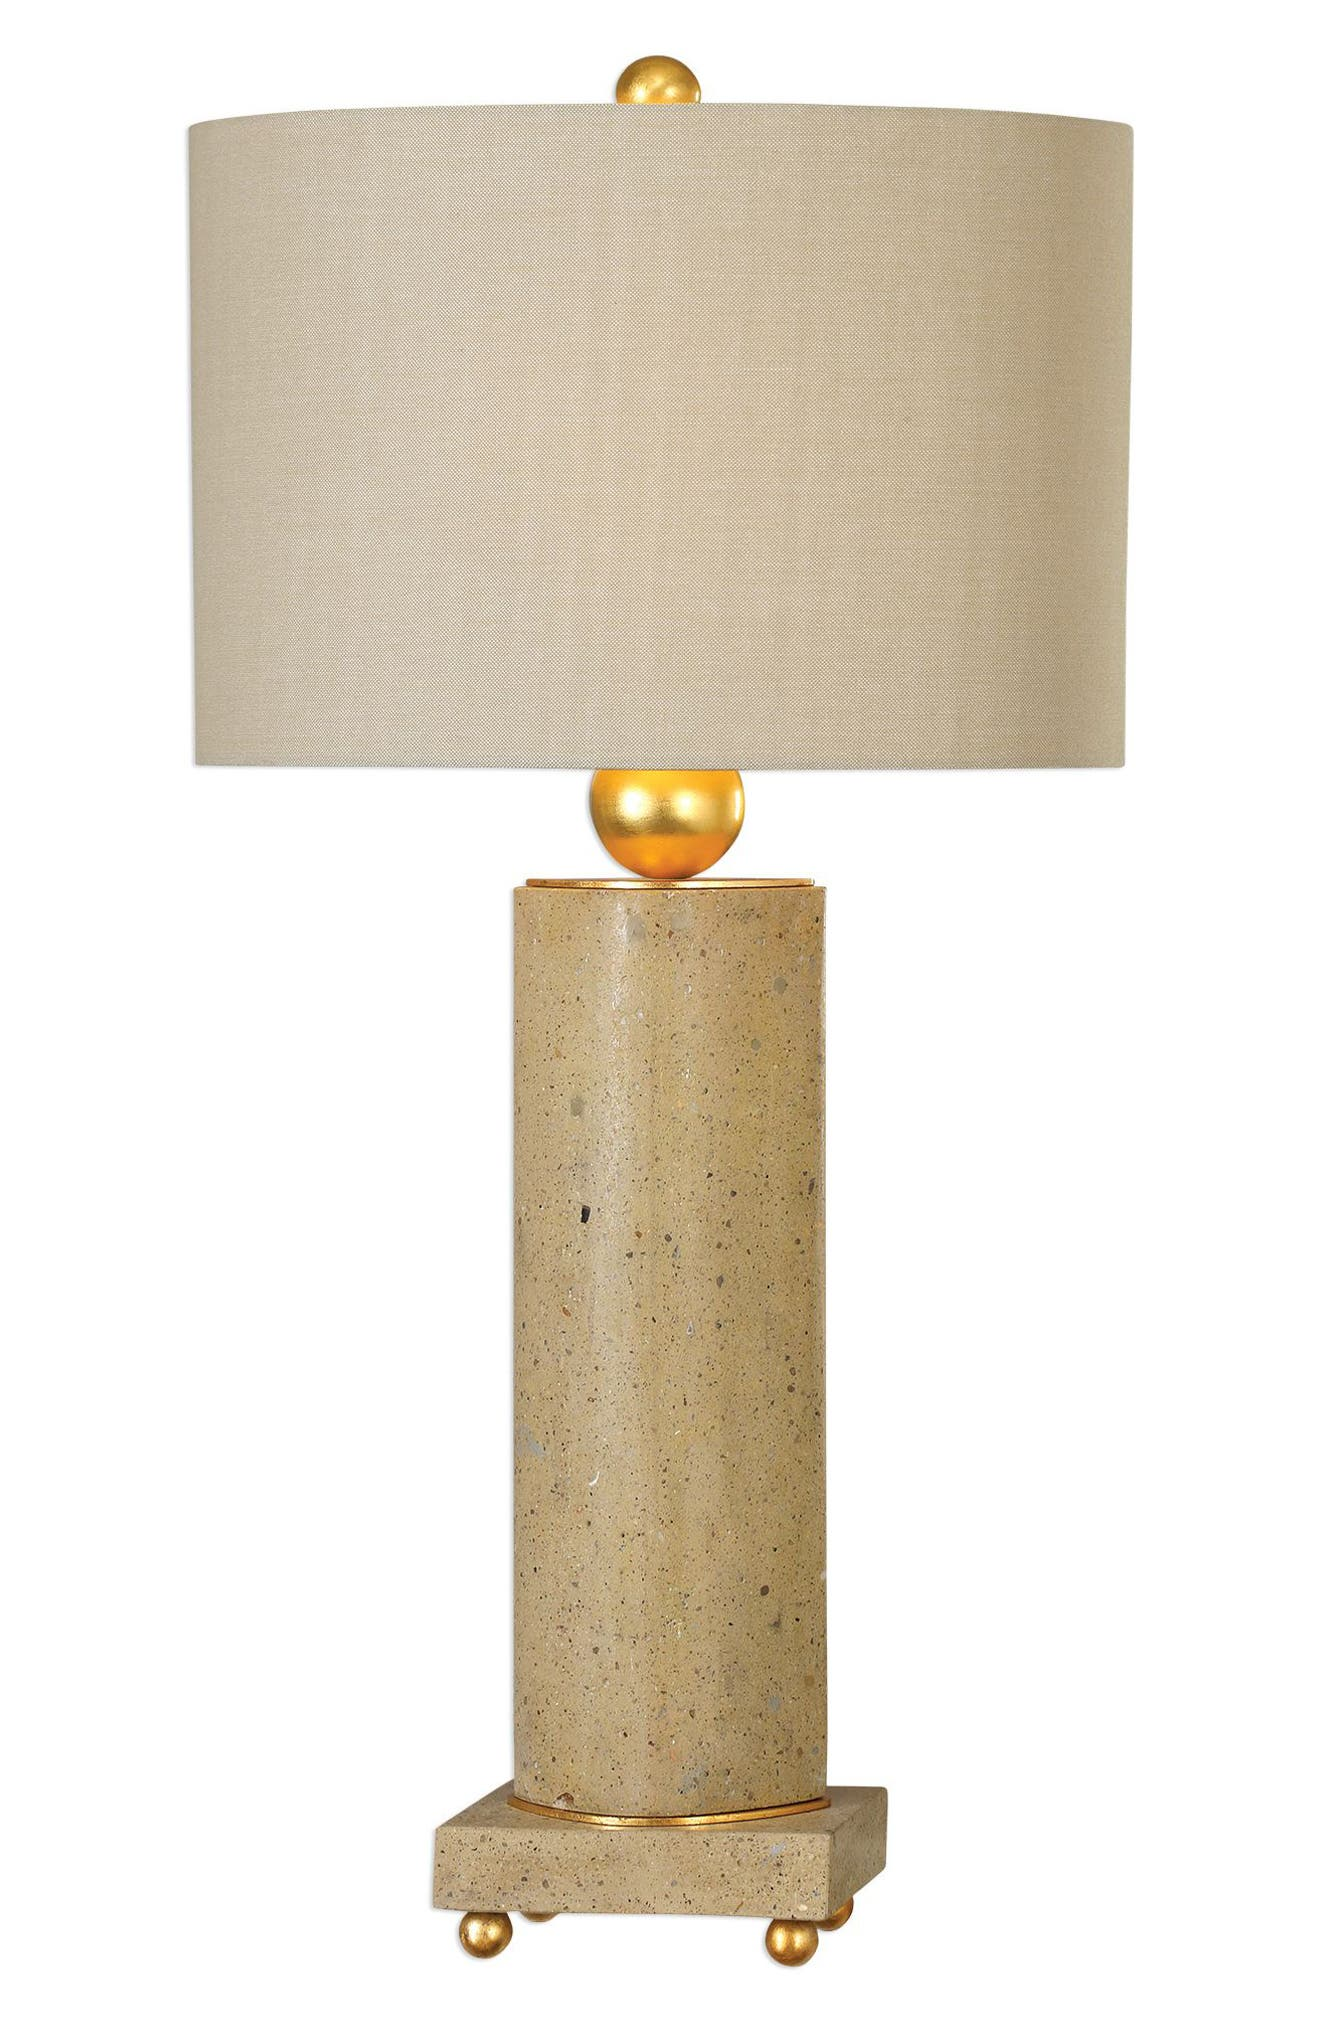 Krisel Oval Column Lamp,                             Main thumbnail 1, color,                             STEEL W GOLD LEAF/ BEIGE SHADE